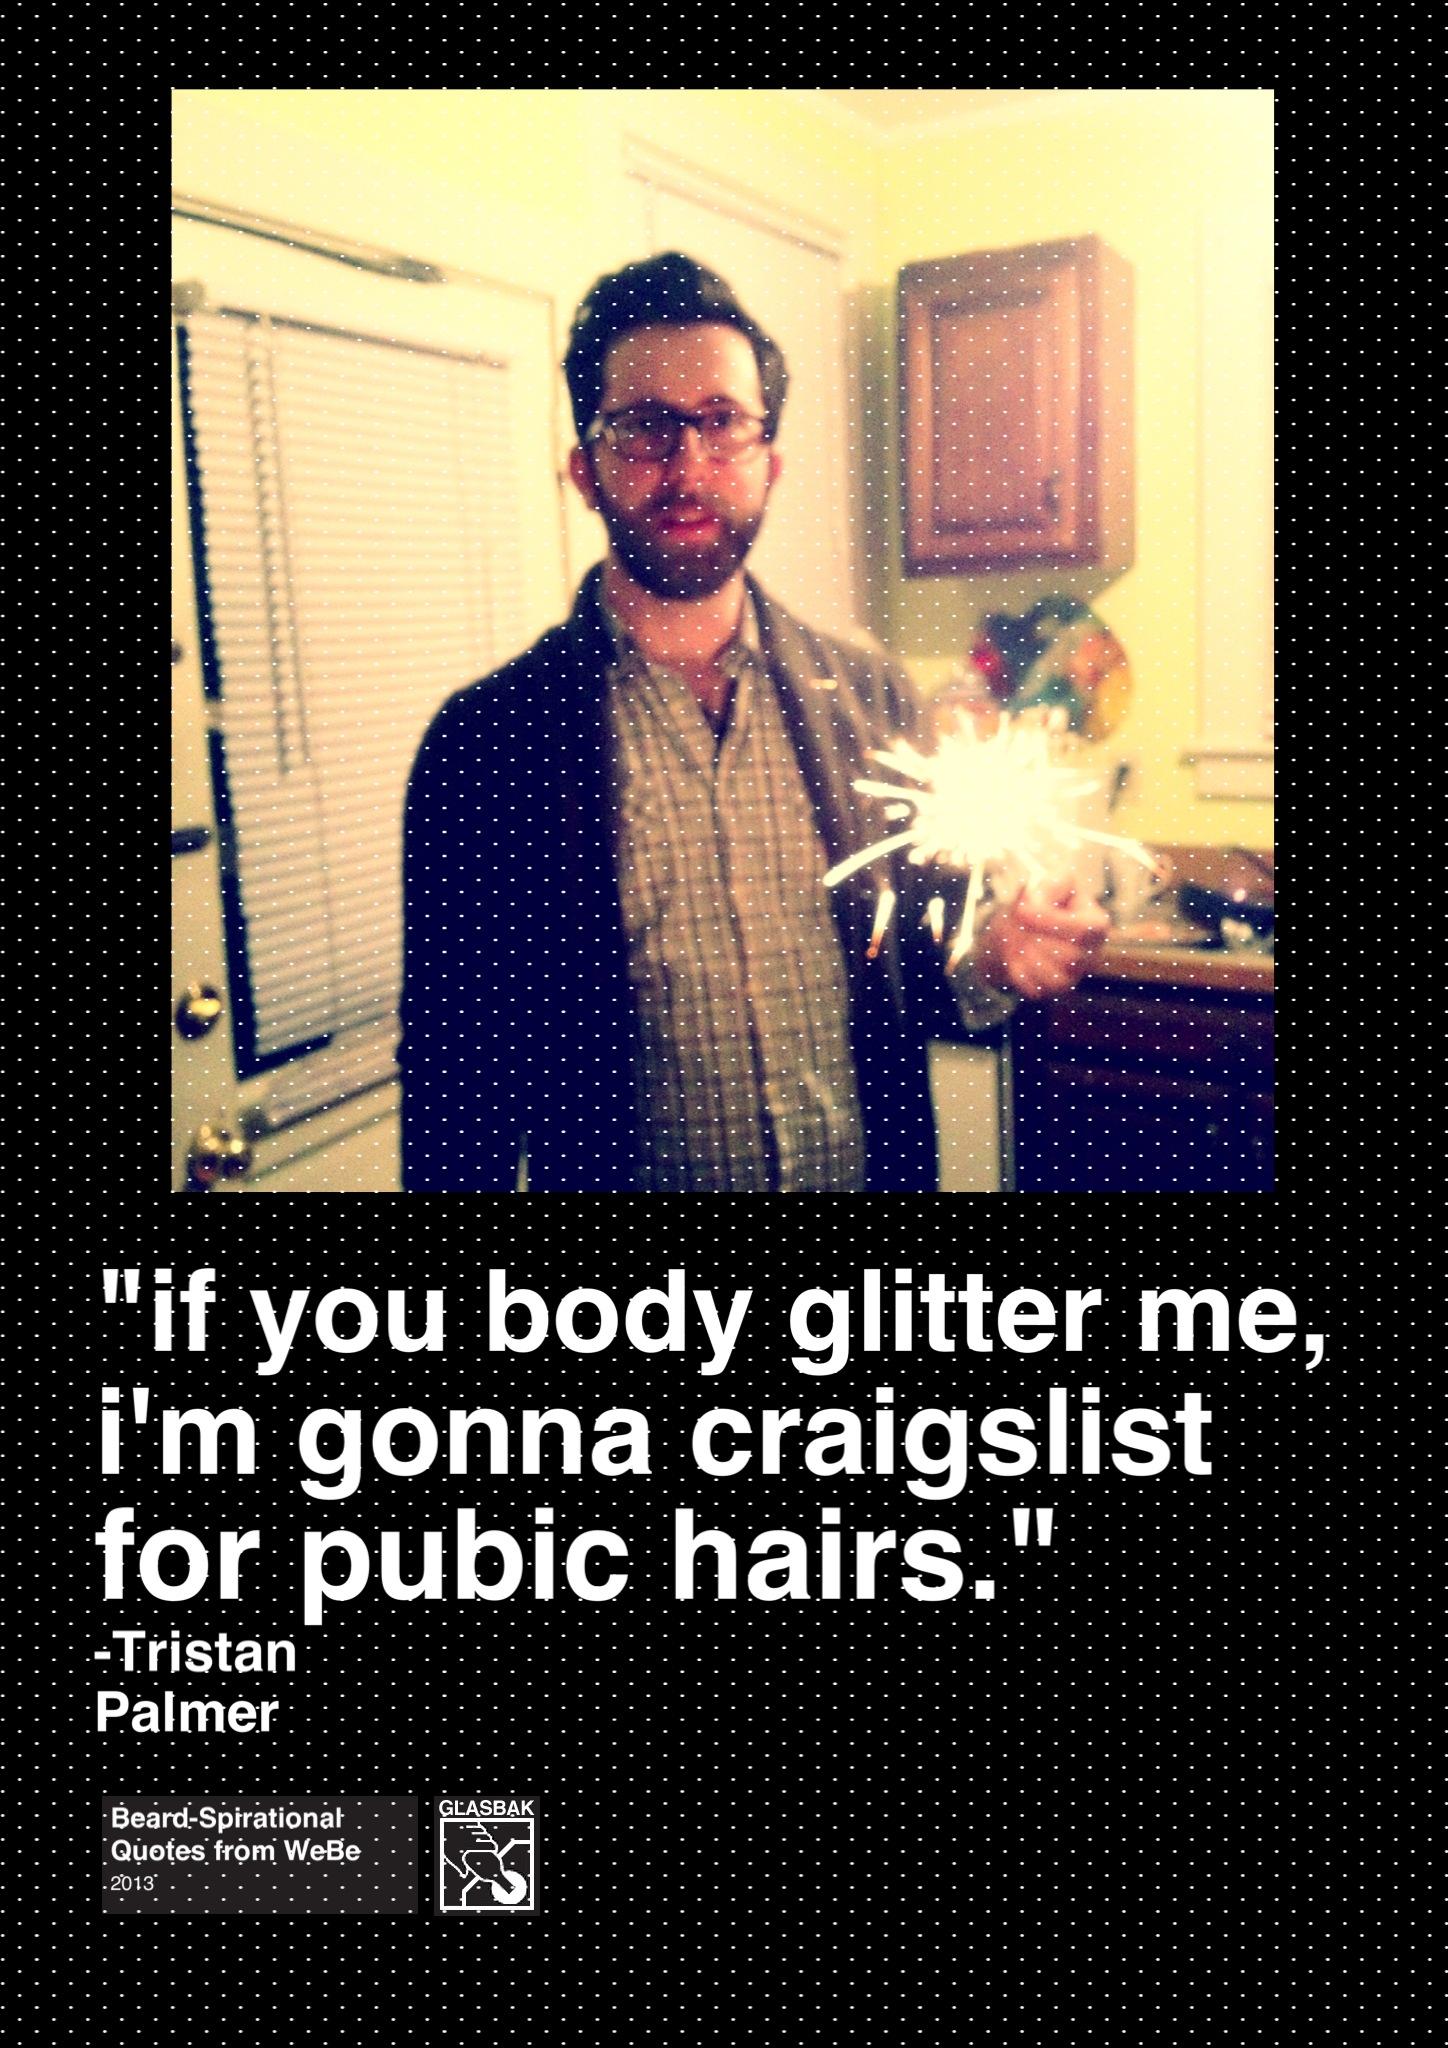 2013-04-08_if you body glitter me, i'm gonna craigslist for pubic hairs.jpg